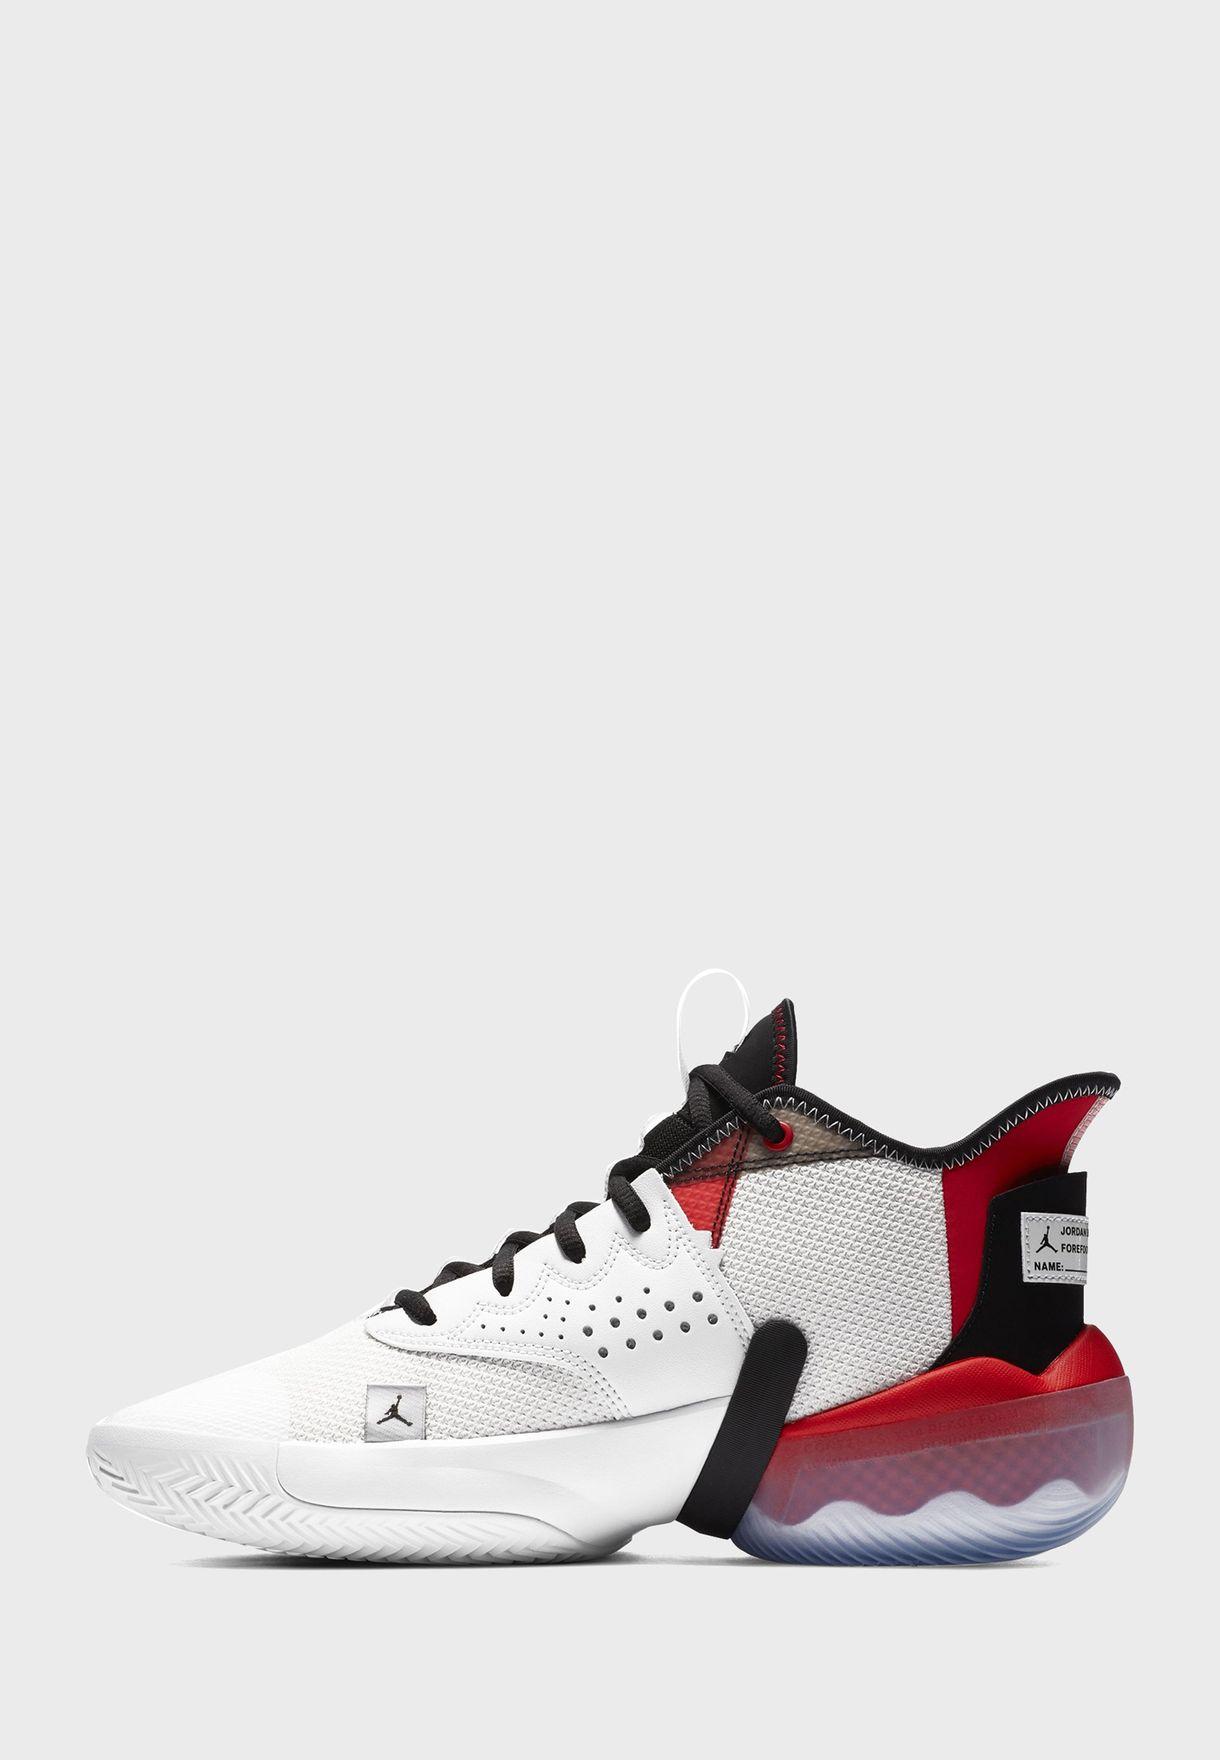 حذاء جوردان تيم اليفيت